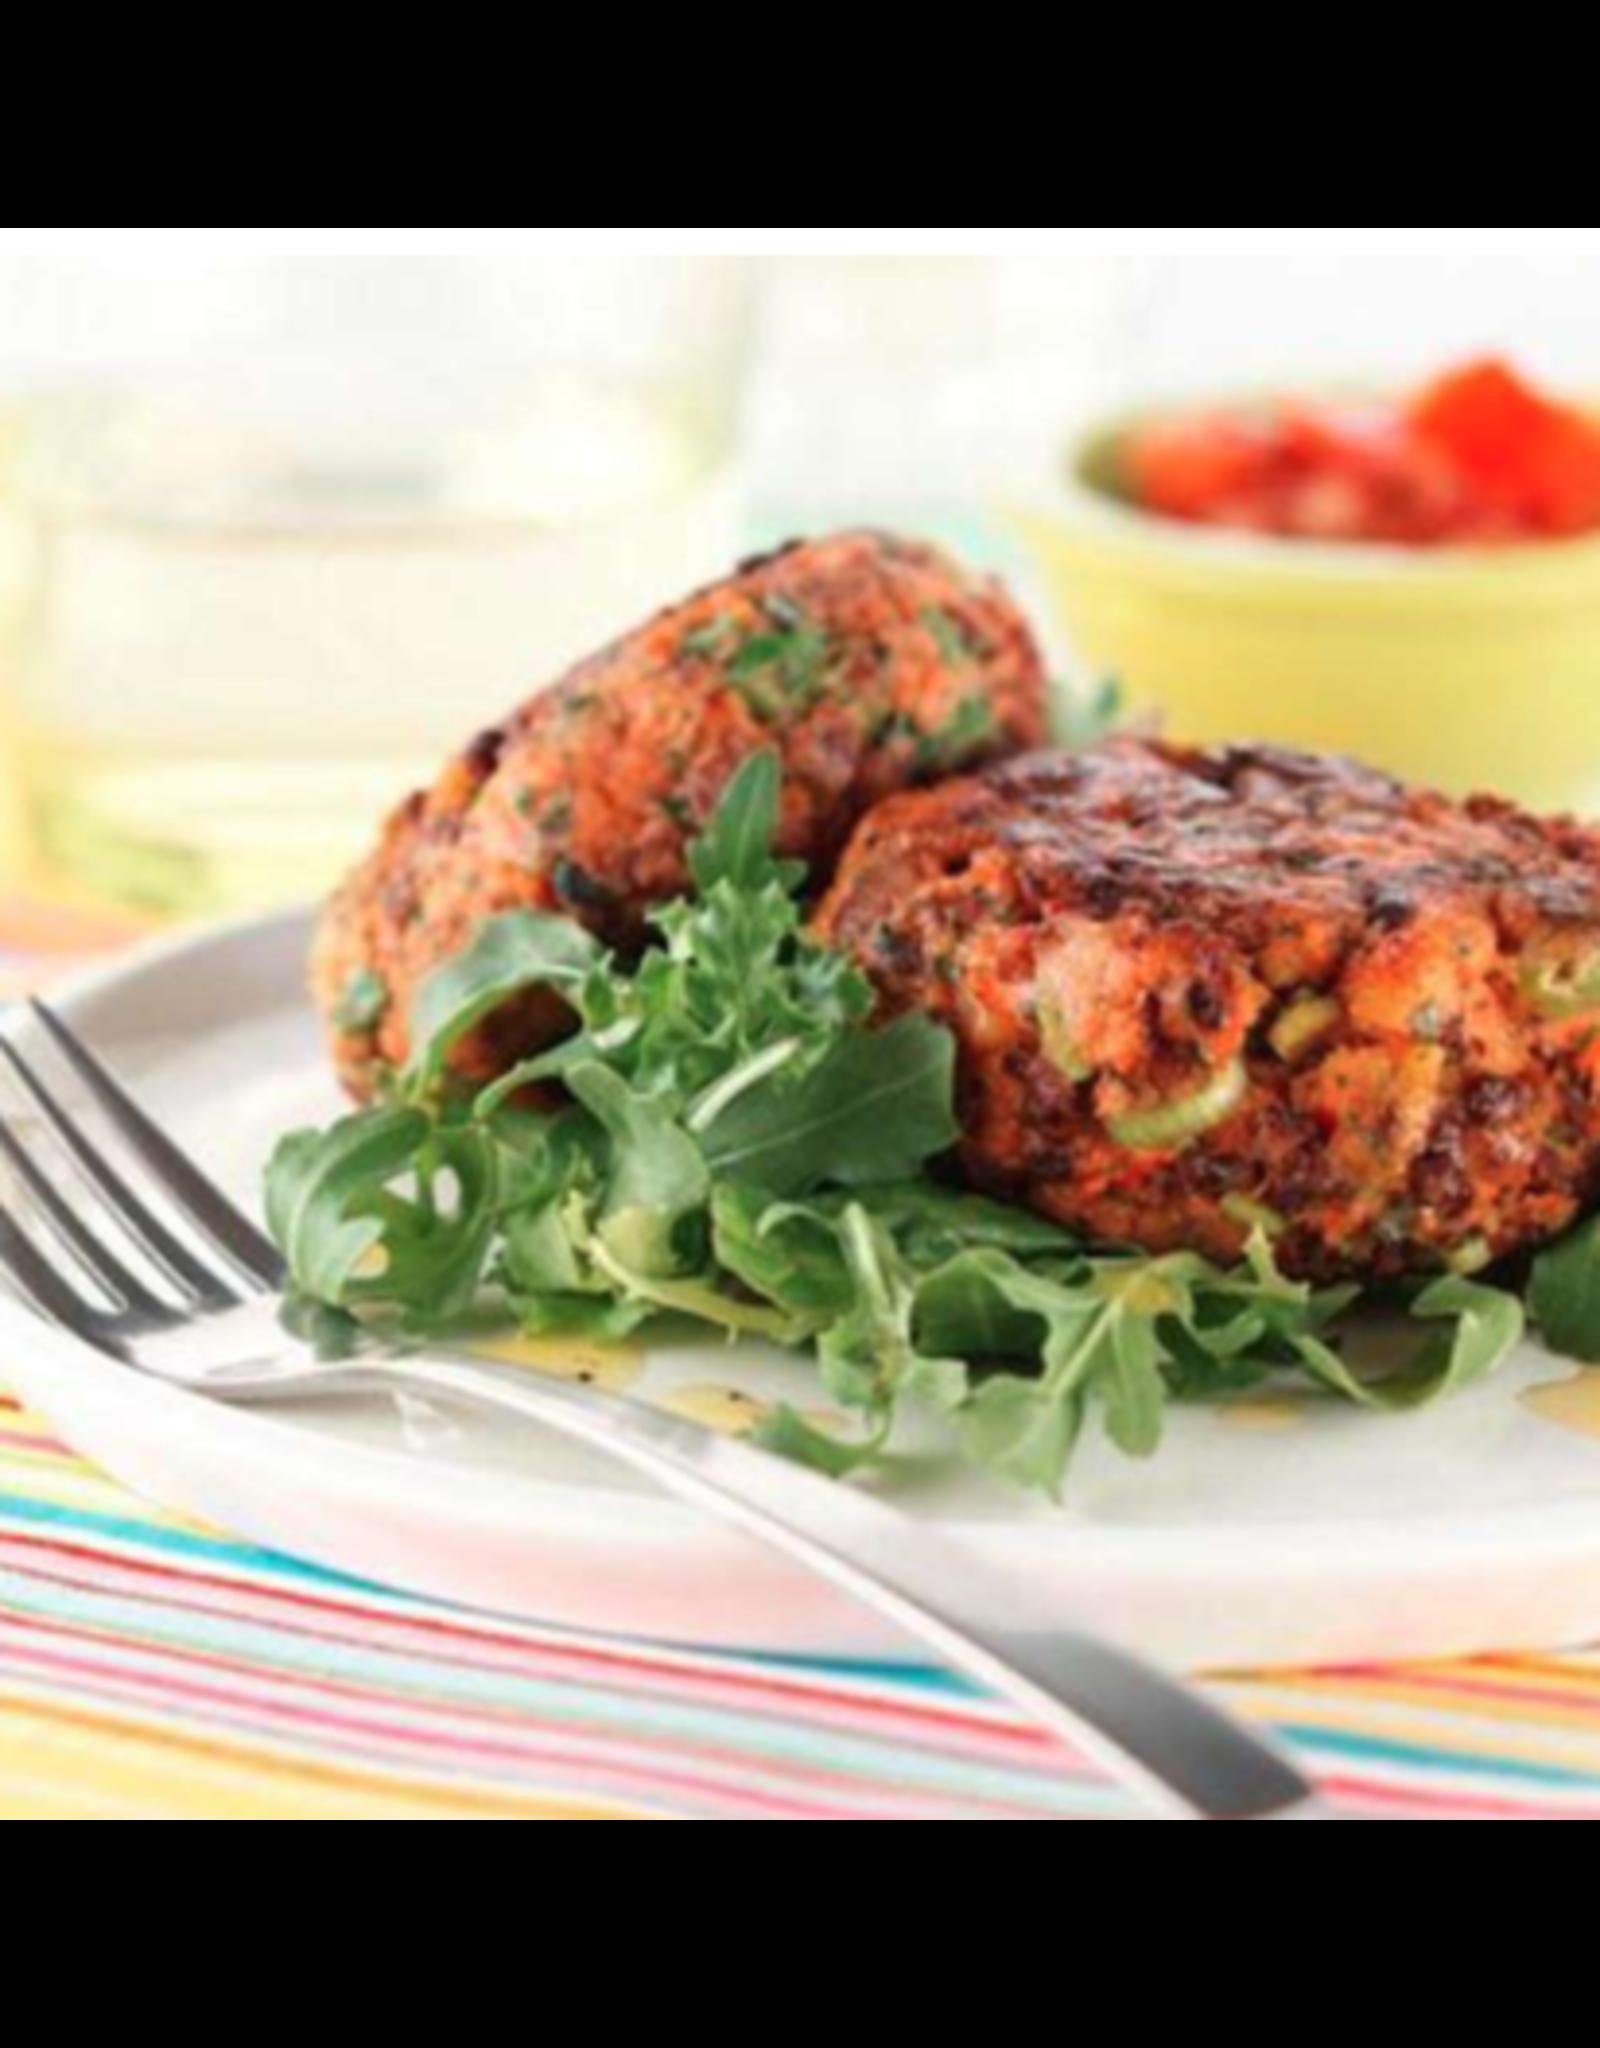 Quorn Scharfe Burger (scharf & pikant), 264g  ❄️❄️❄️